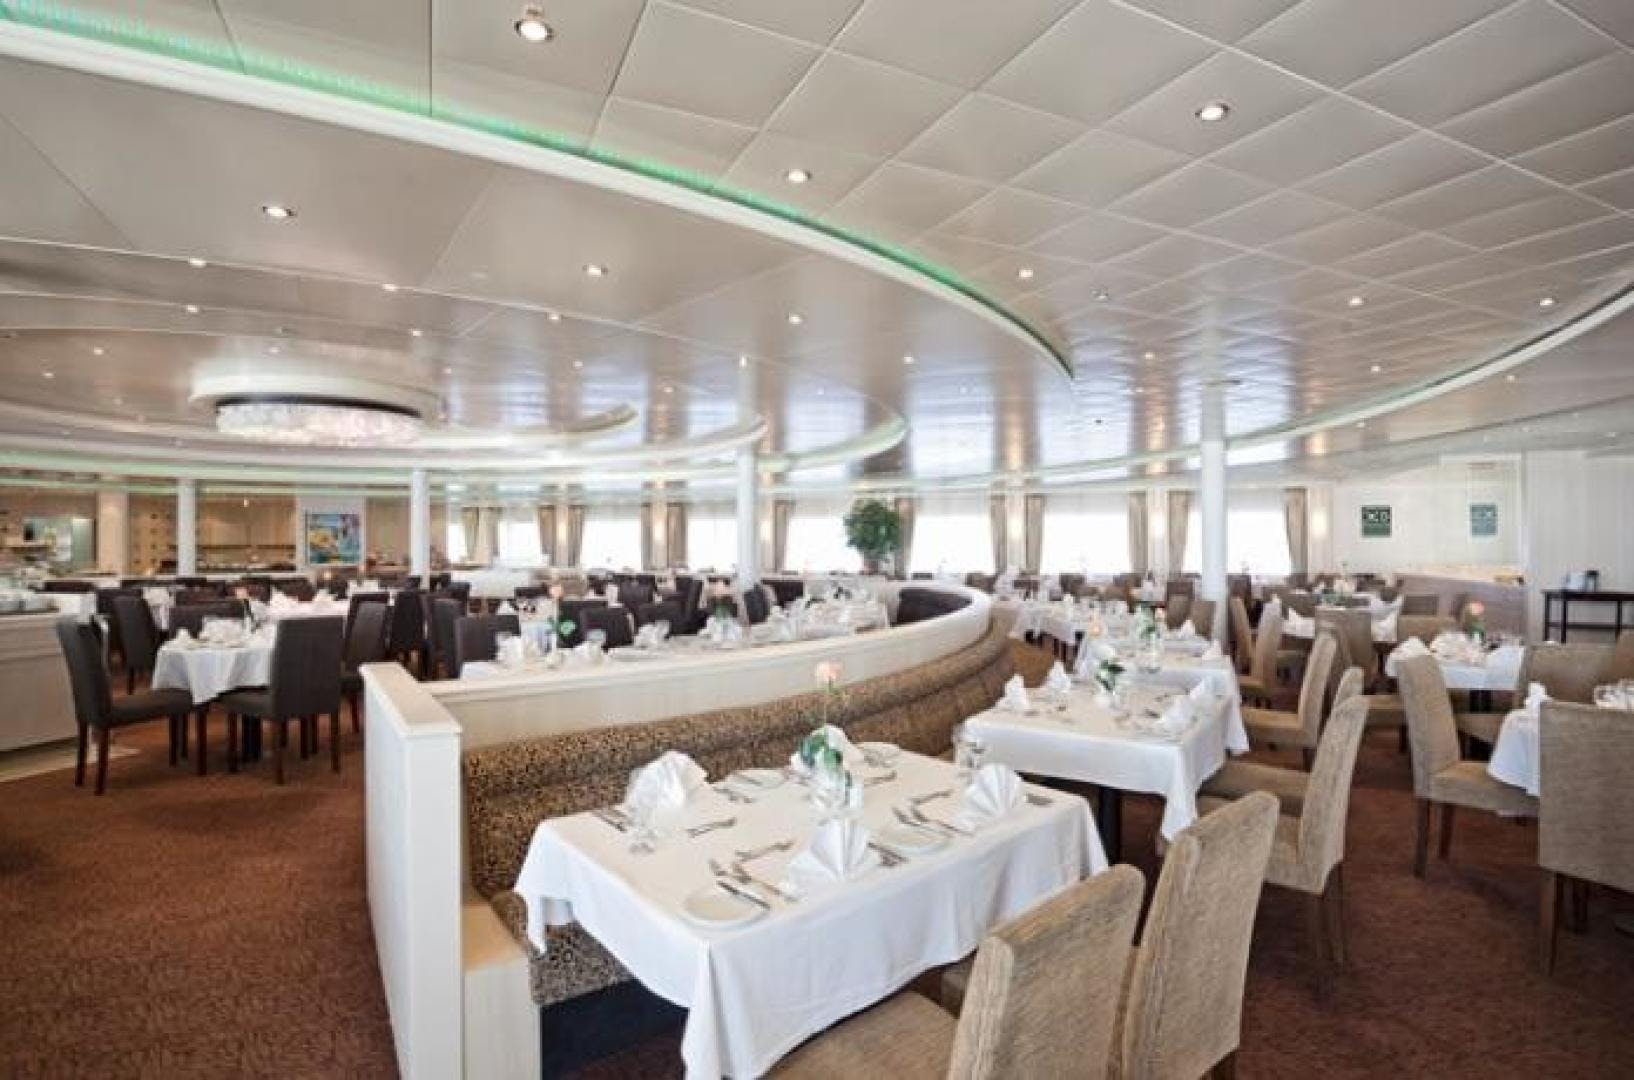 1990 Custom 579' ISHIKAWAJIMA Cruise Ship Aegean Paradise | Picture 5 of 14